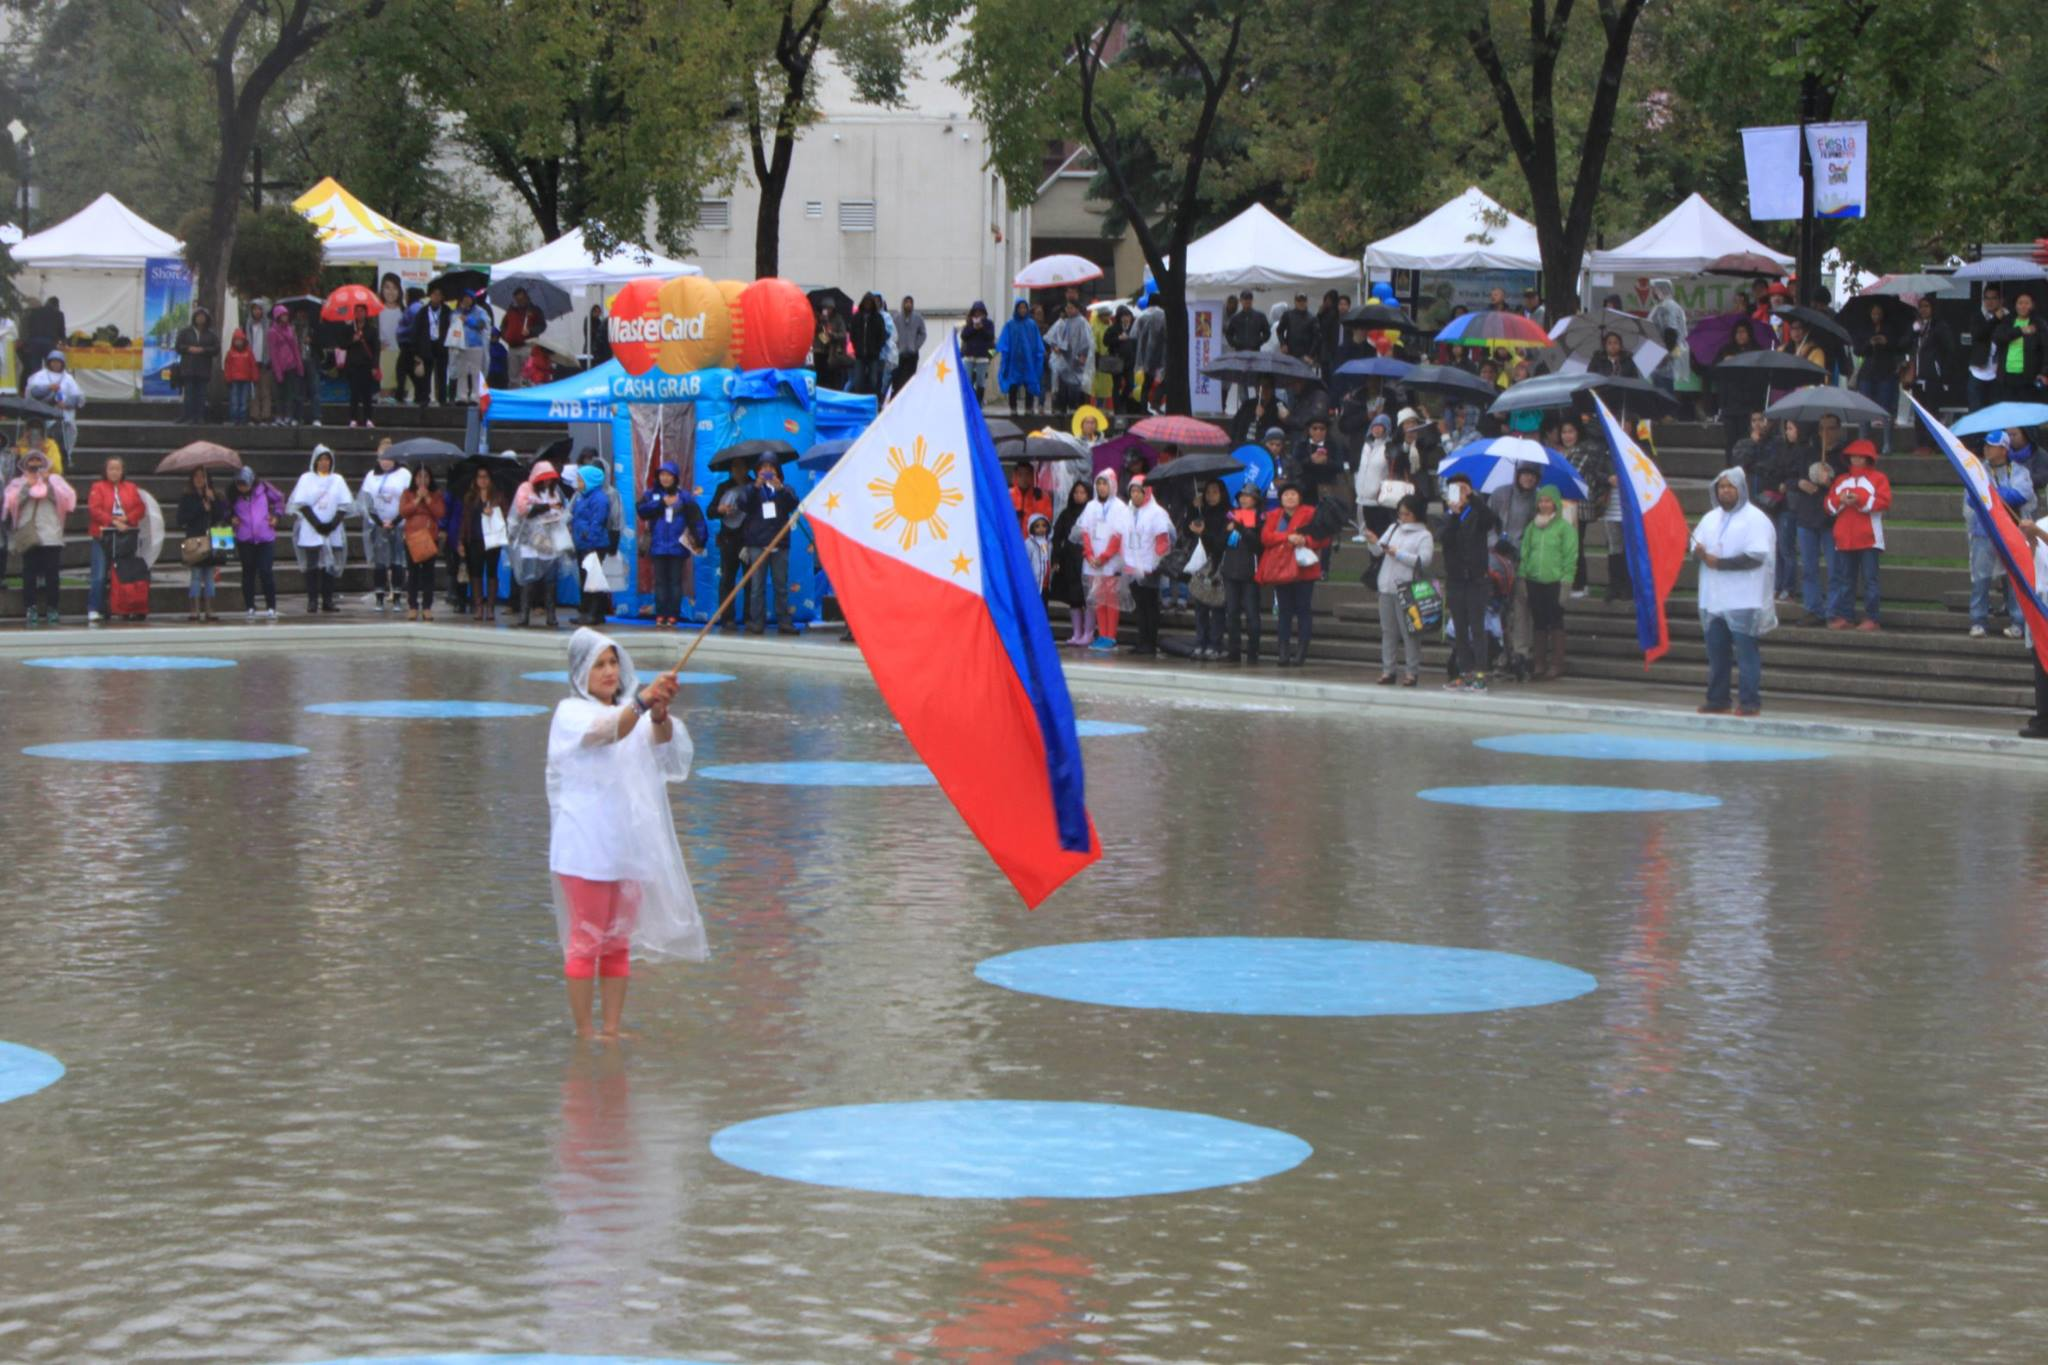 Fiesta Filipino brings food, entertainment to Olympic Plaza